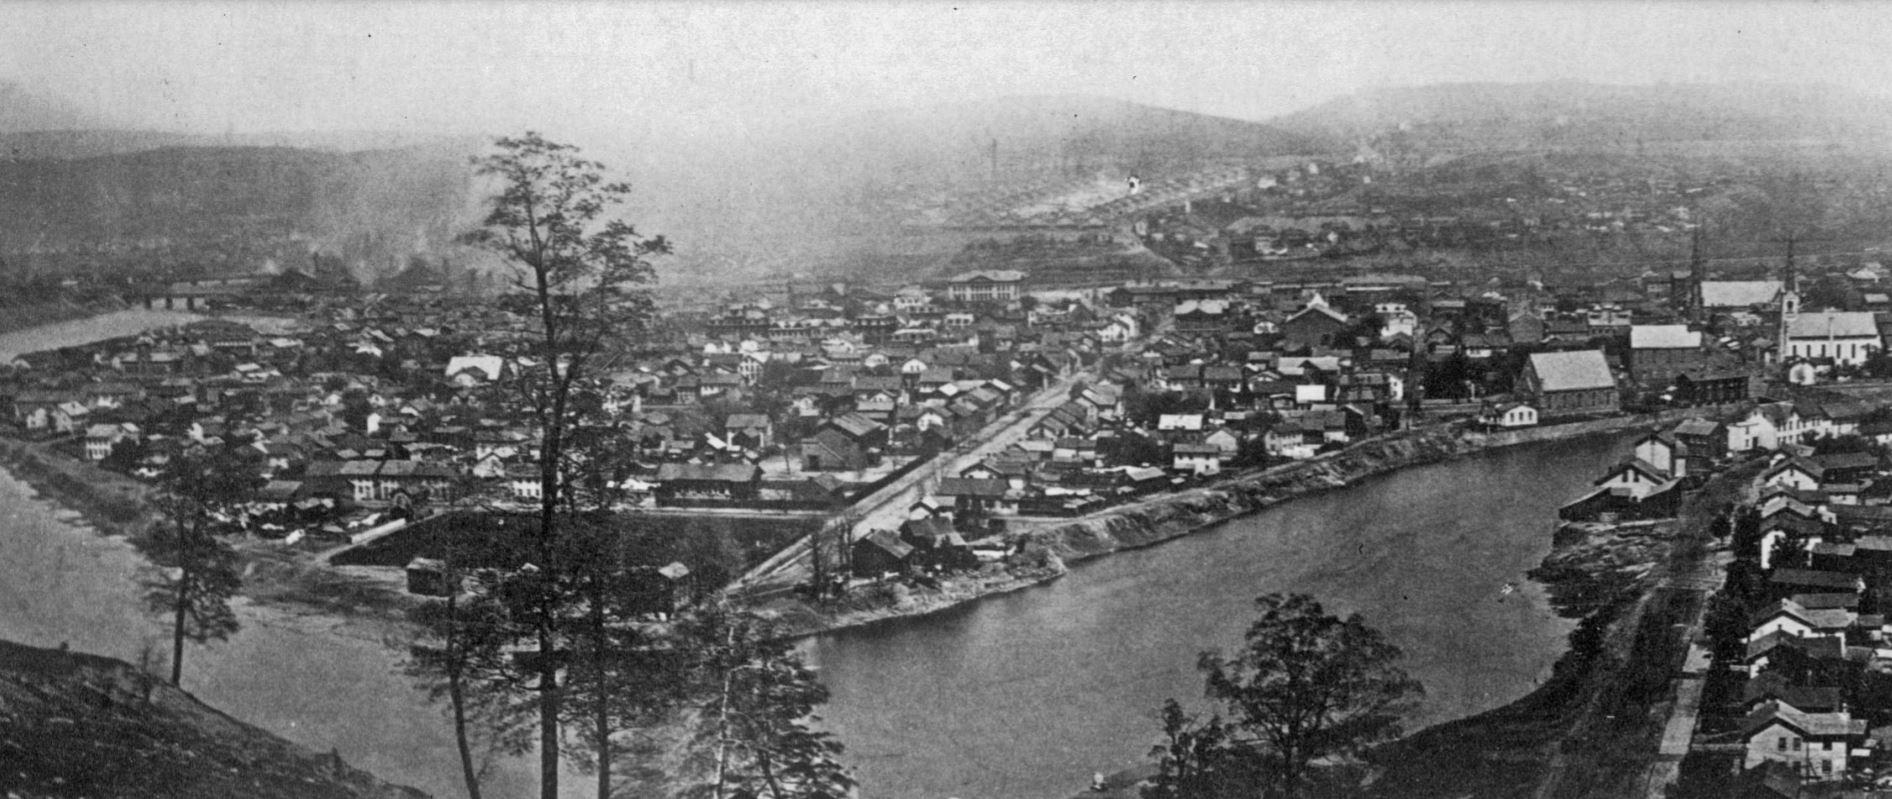 Downtown Johnstown Pre-Flood